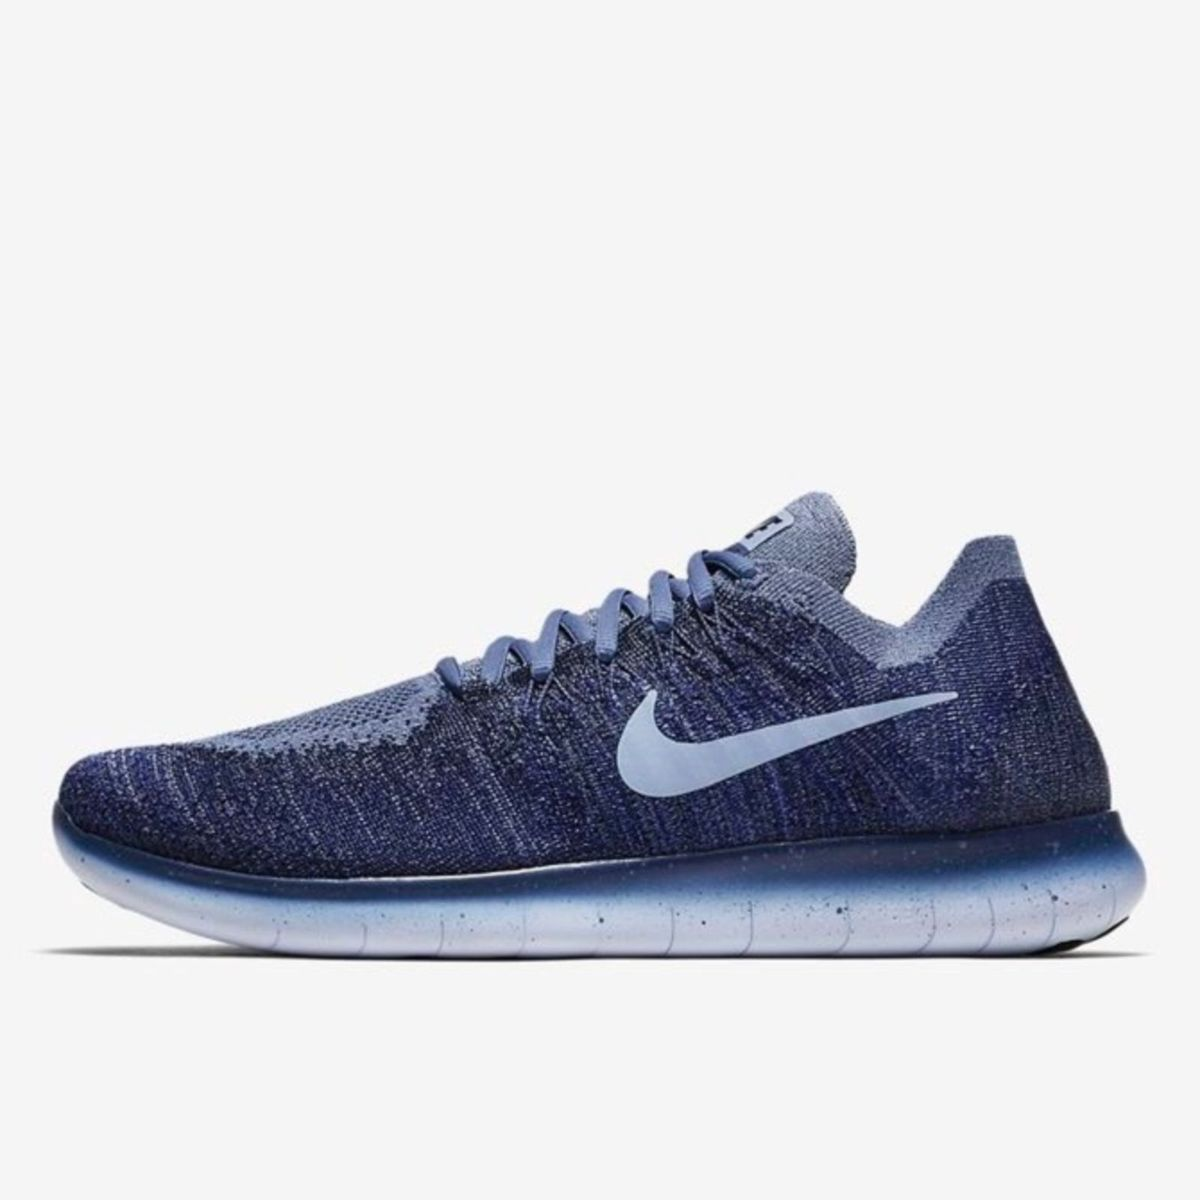 Tênis Corrida Nike Free Rn Flyknit  9fa5e3893a6e1